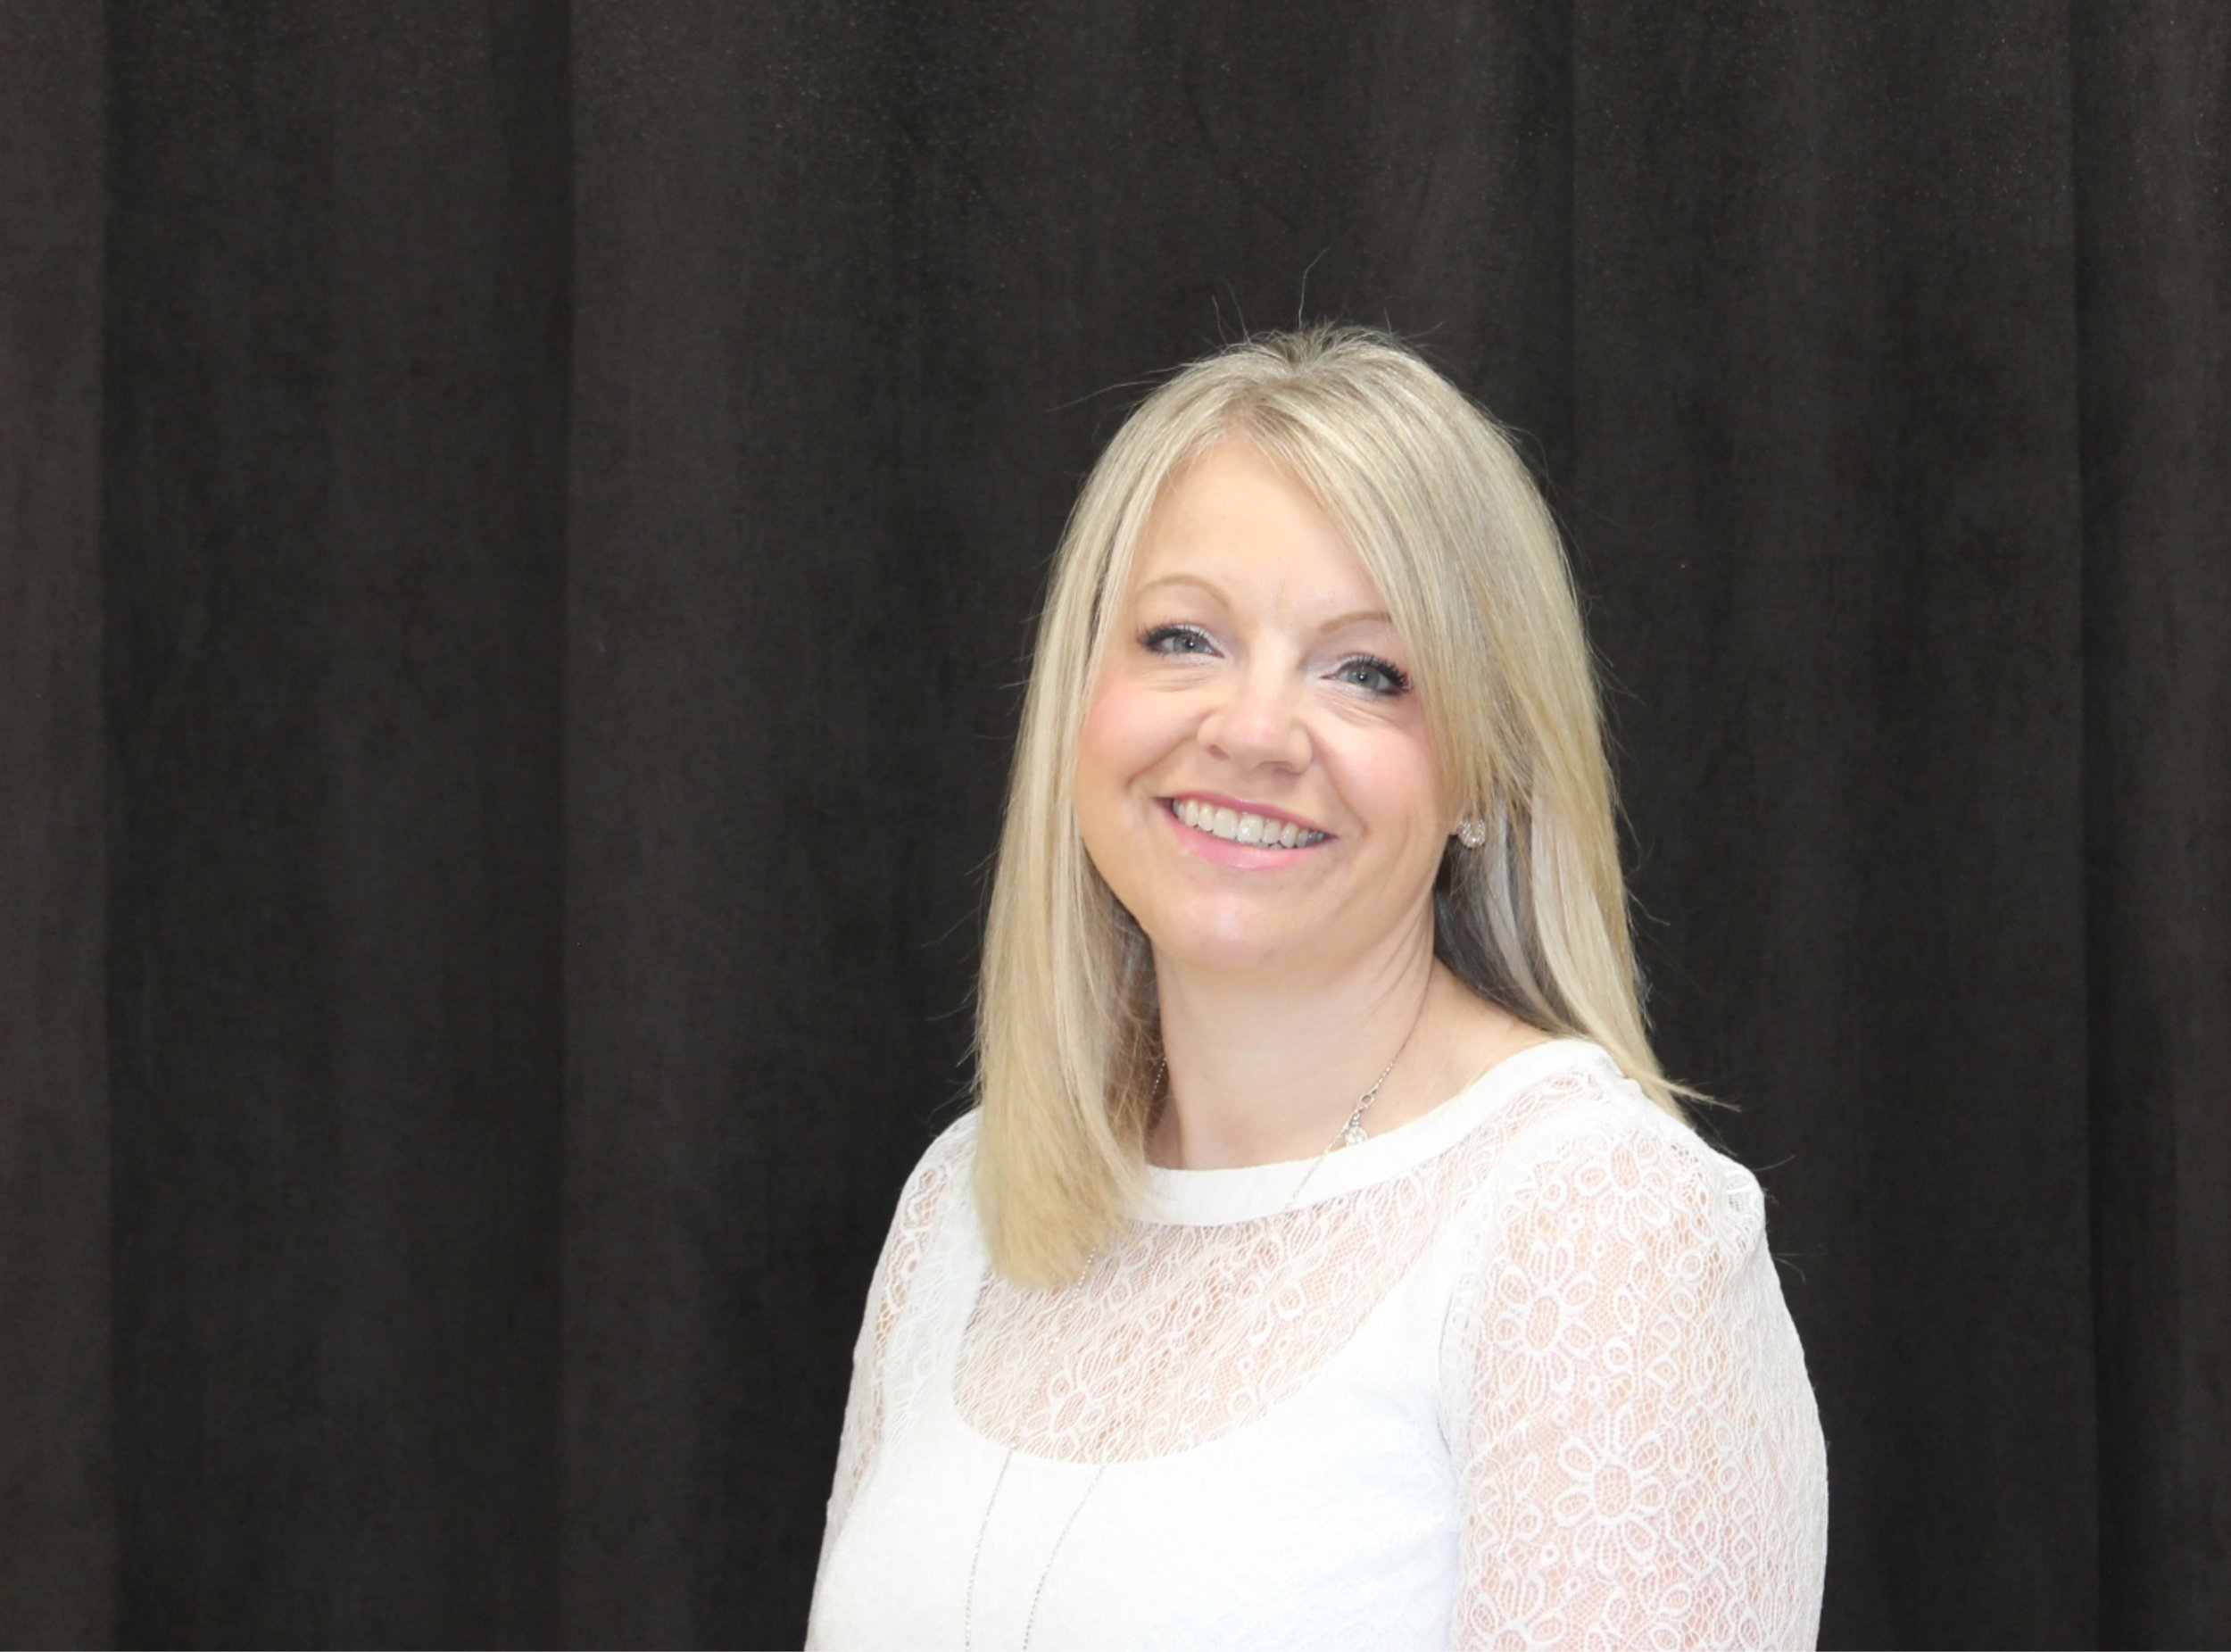 Carmen Sheridan - MA, MBA (Candidate)Dean